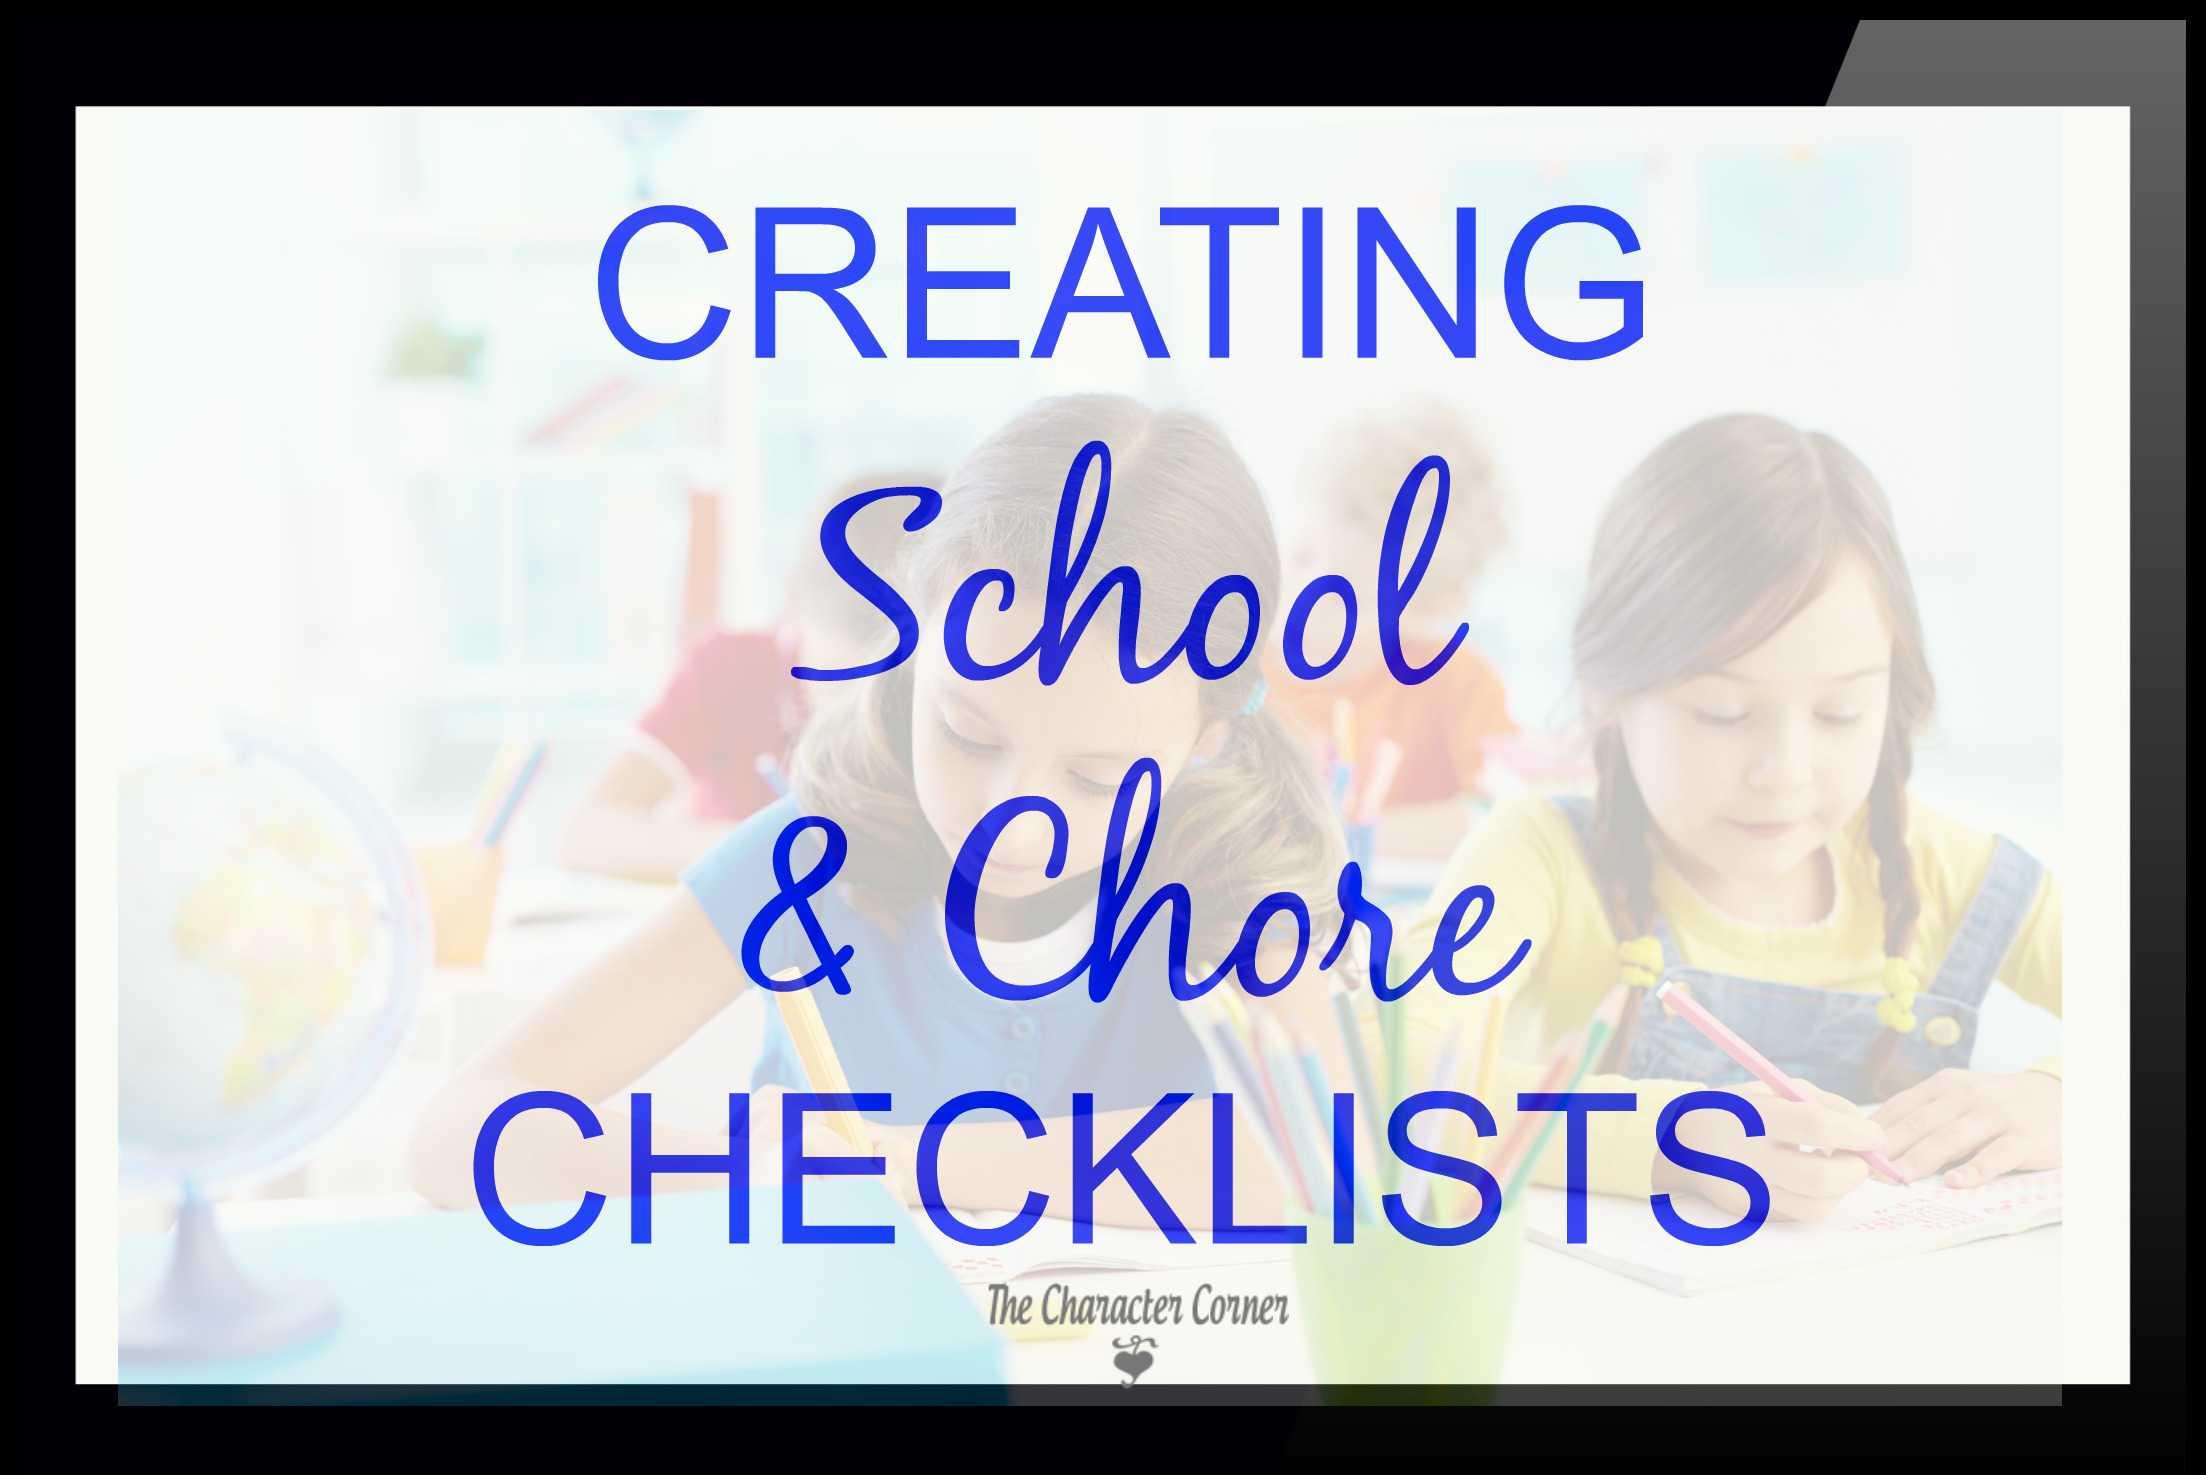 Creating school & chore checklists